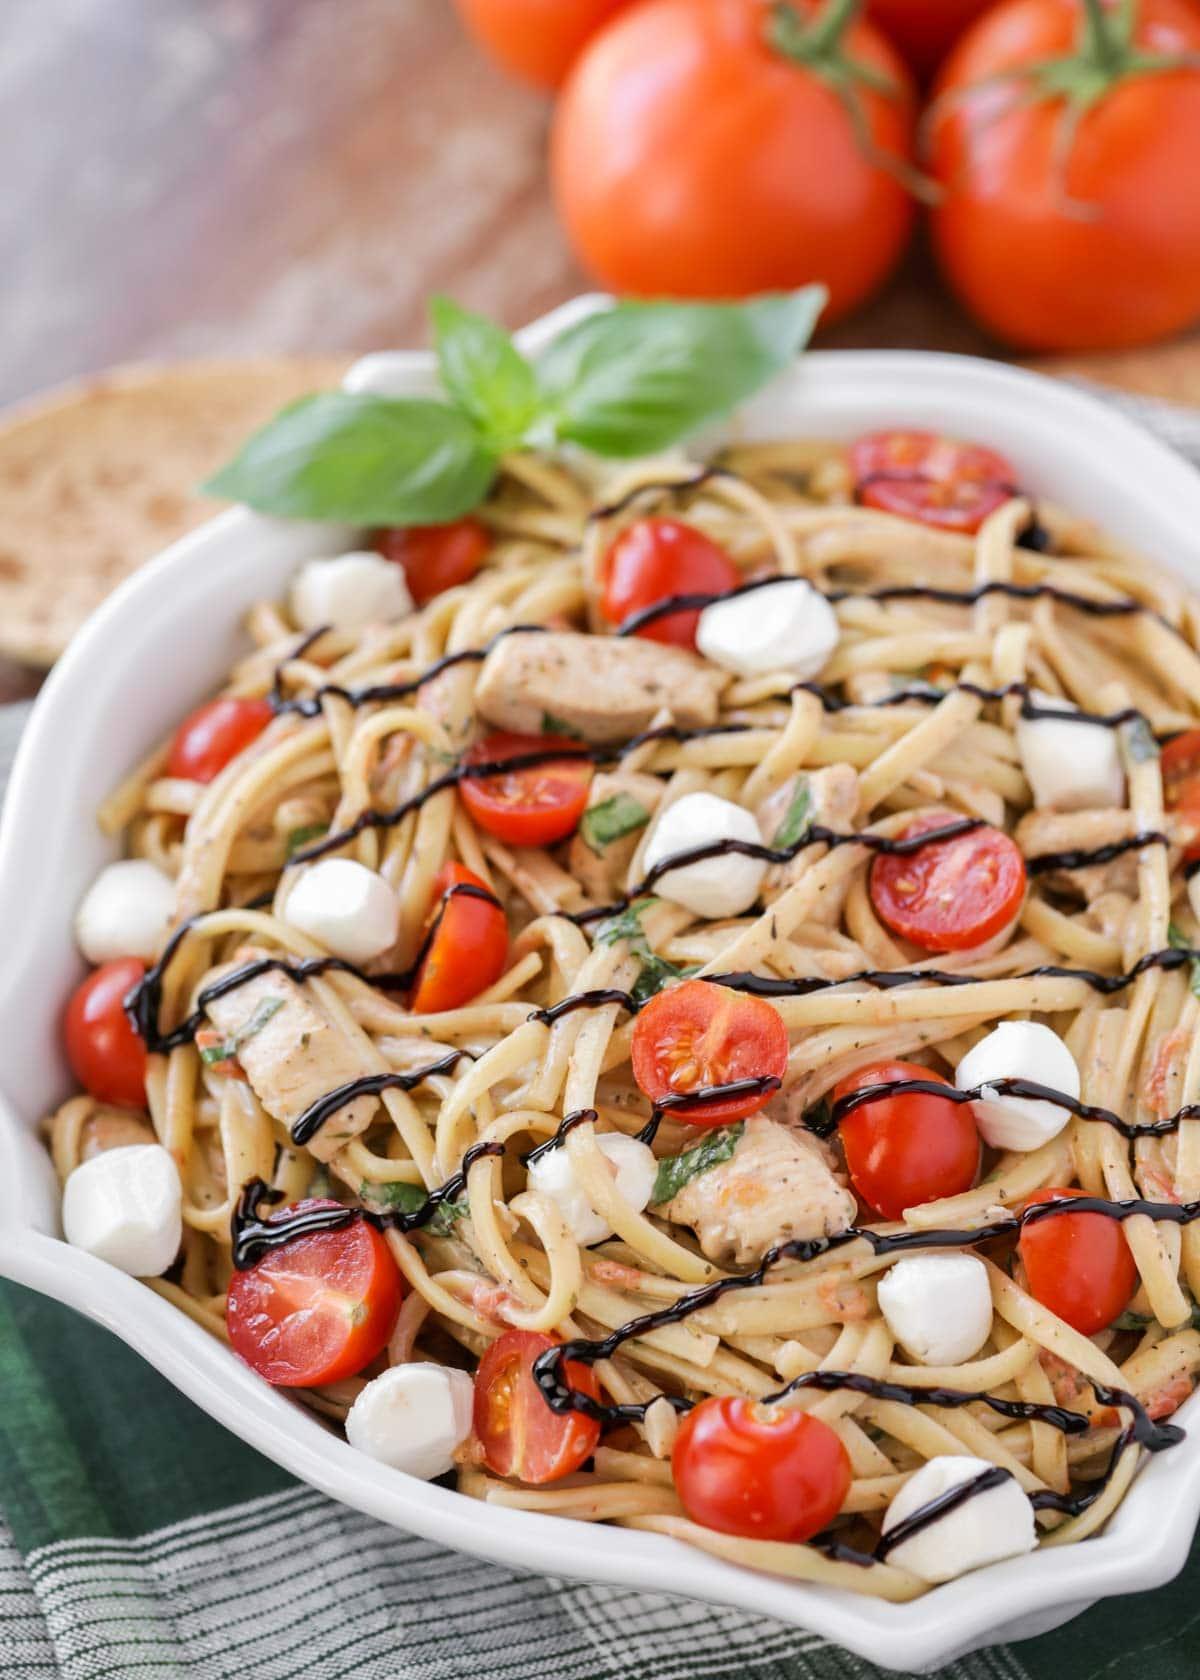 Bruschetta Chicken Pasta recipe drizzled with balsamic glaze